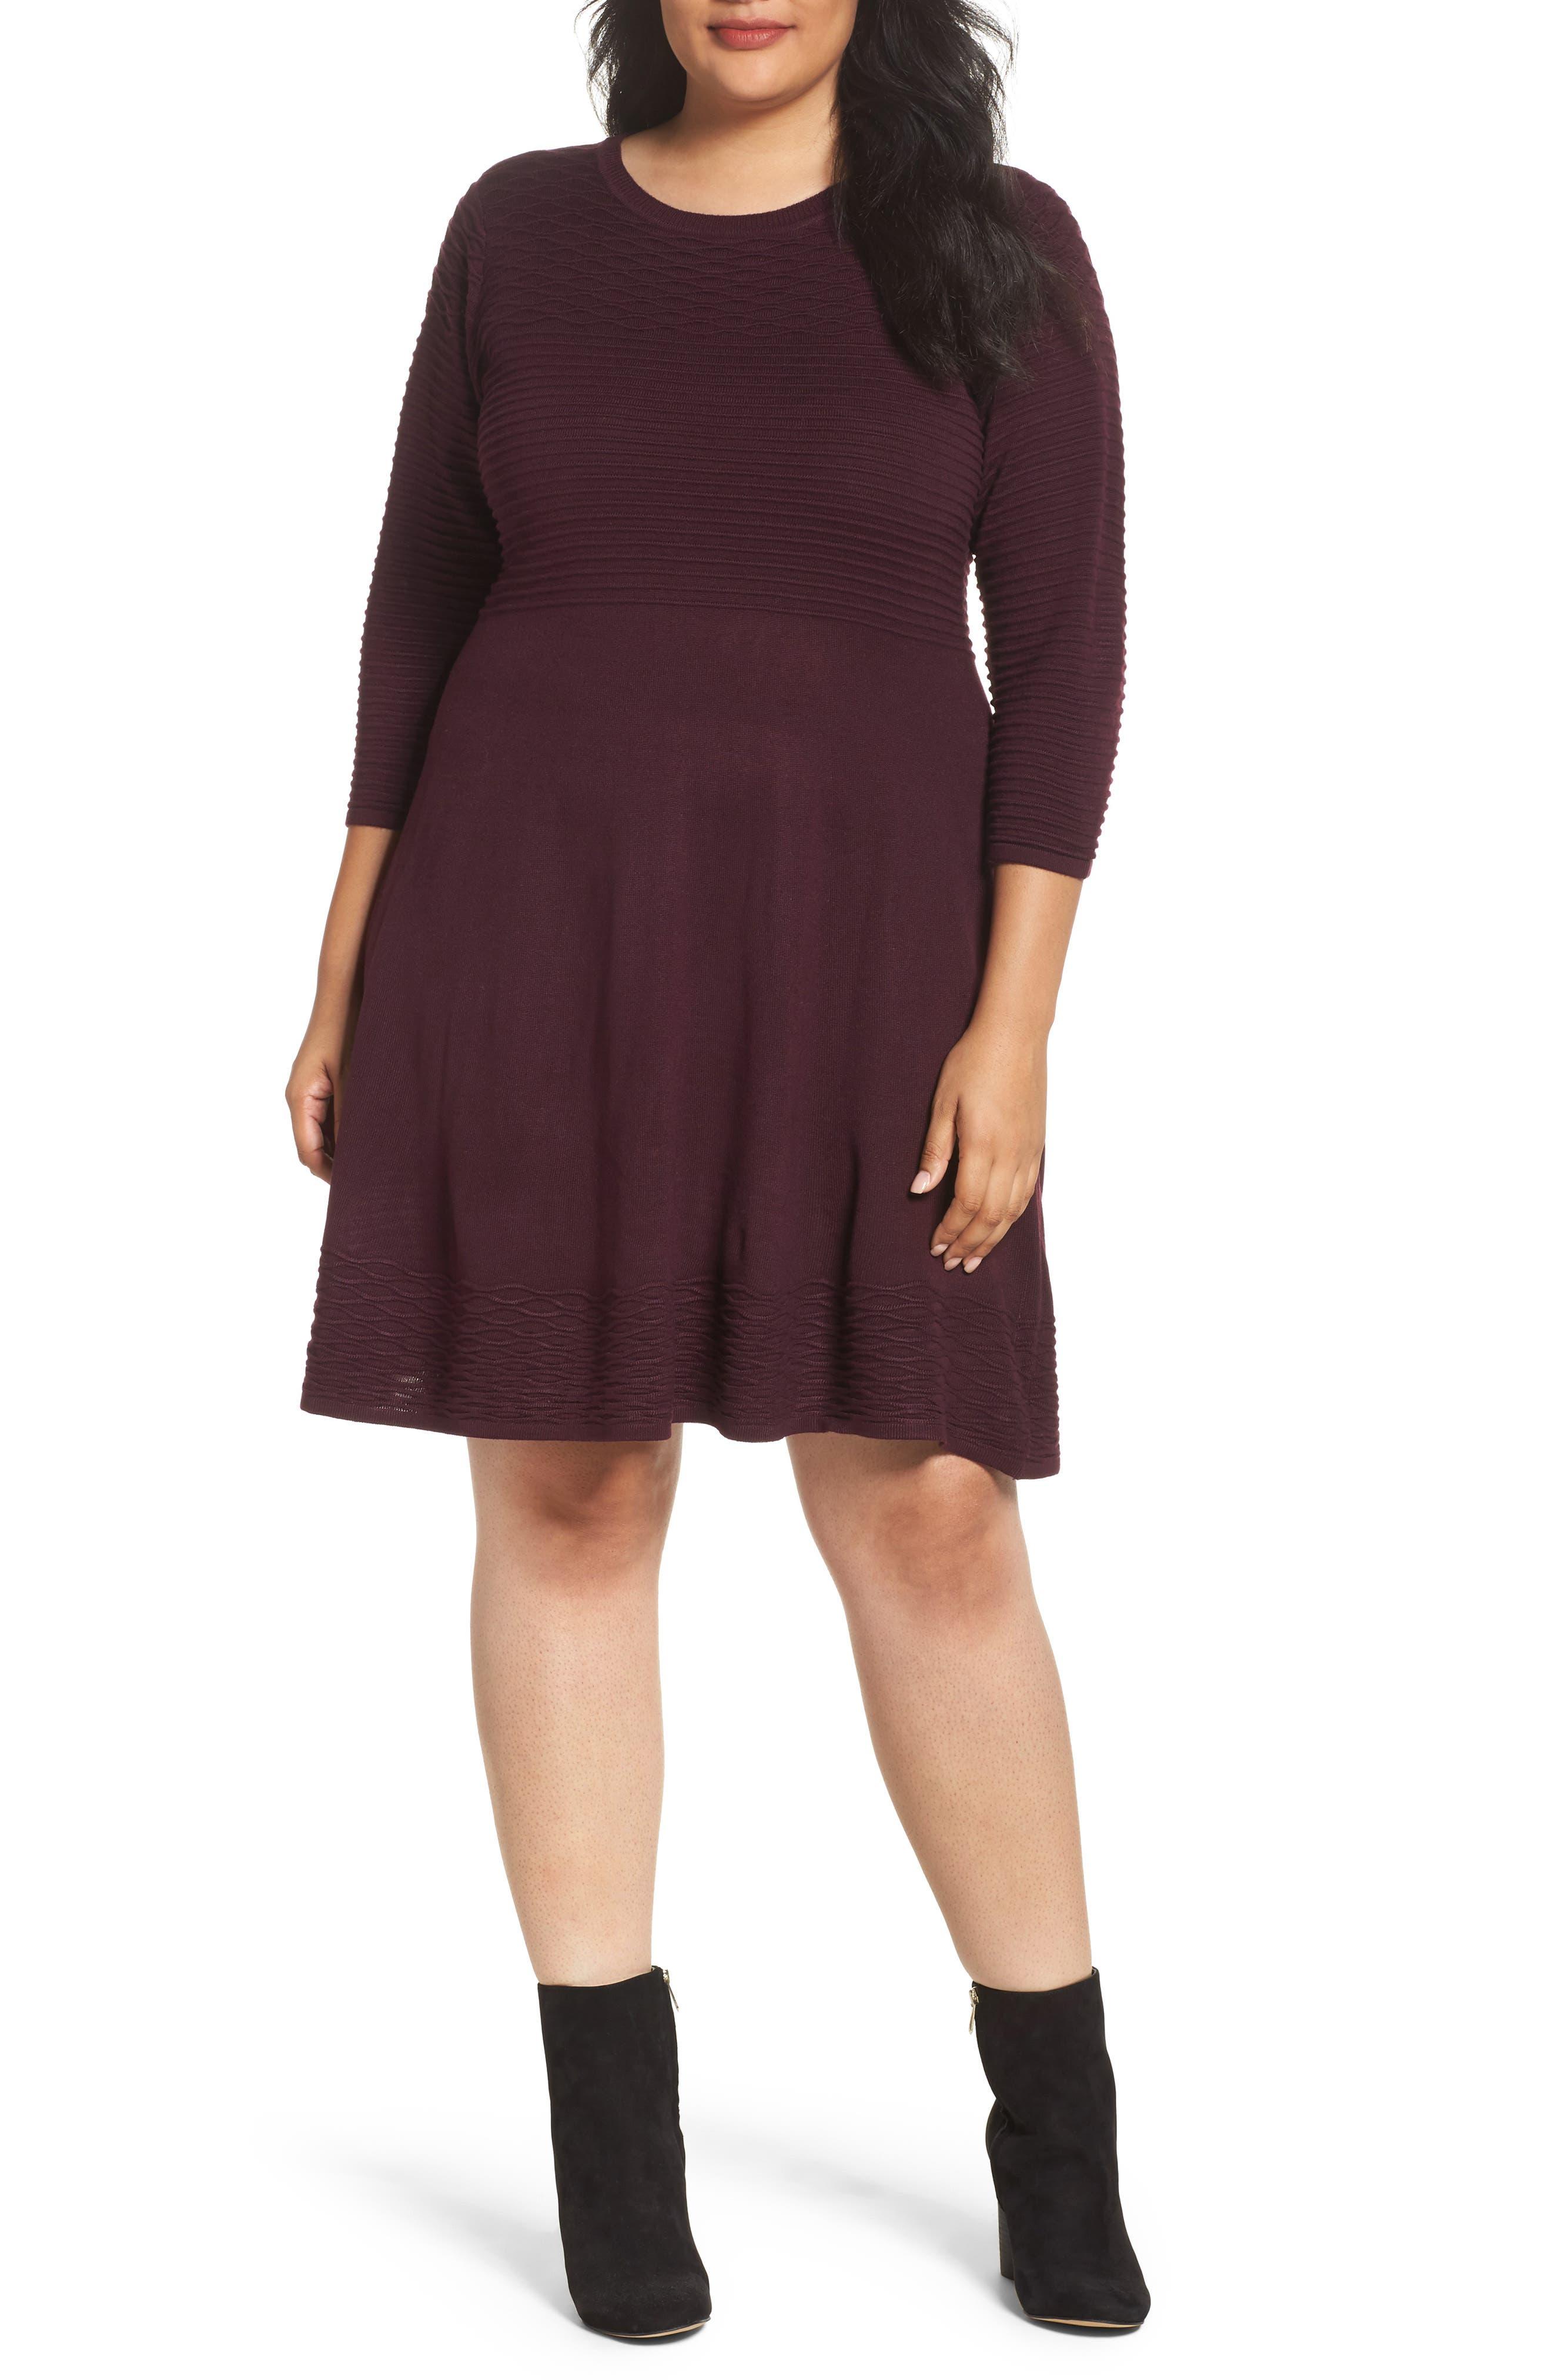 Main Image - Eliza J Knit Fit & Flare Dress (Plus Size)